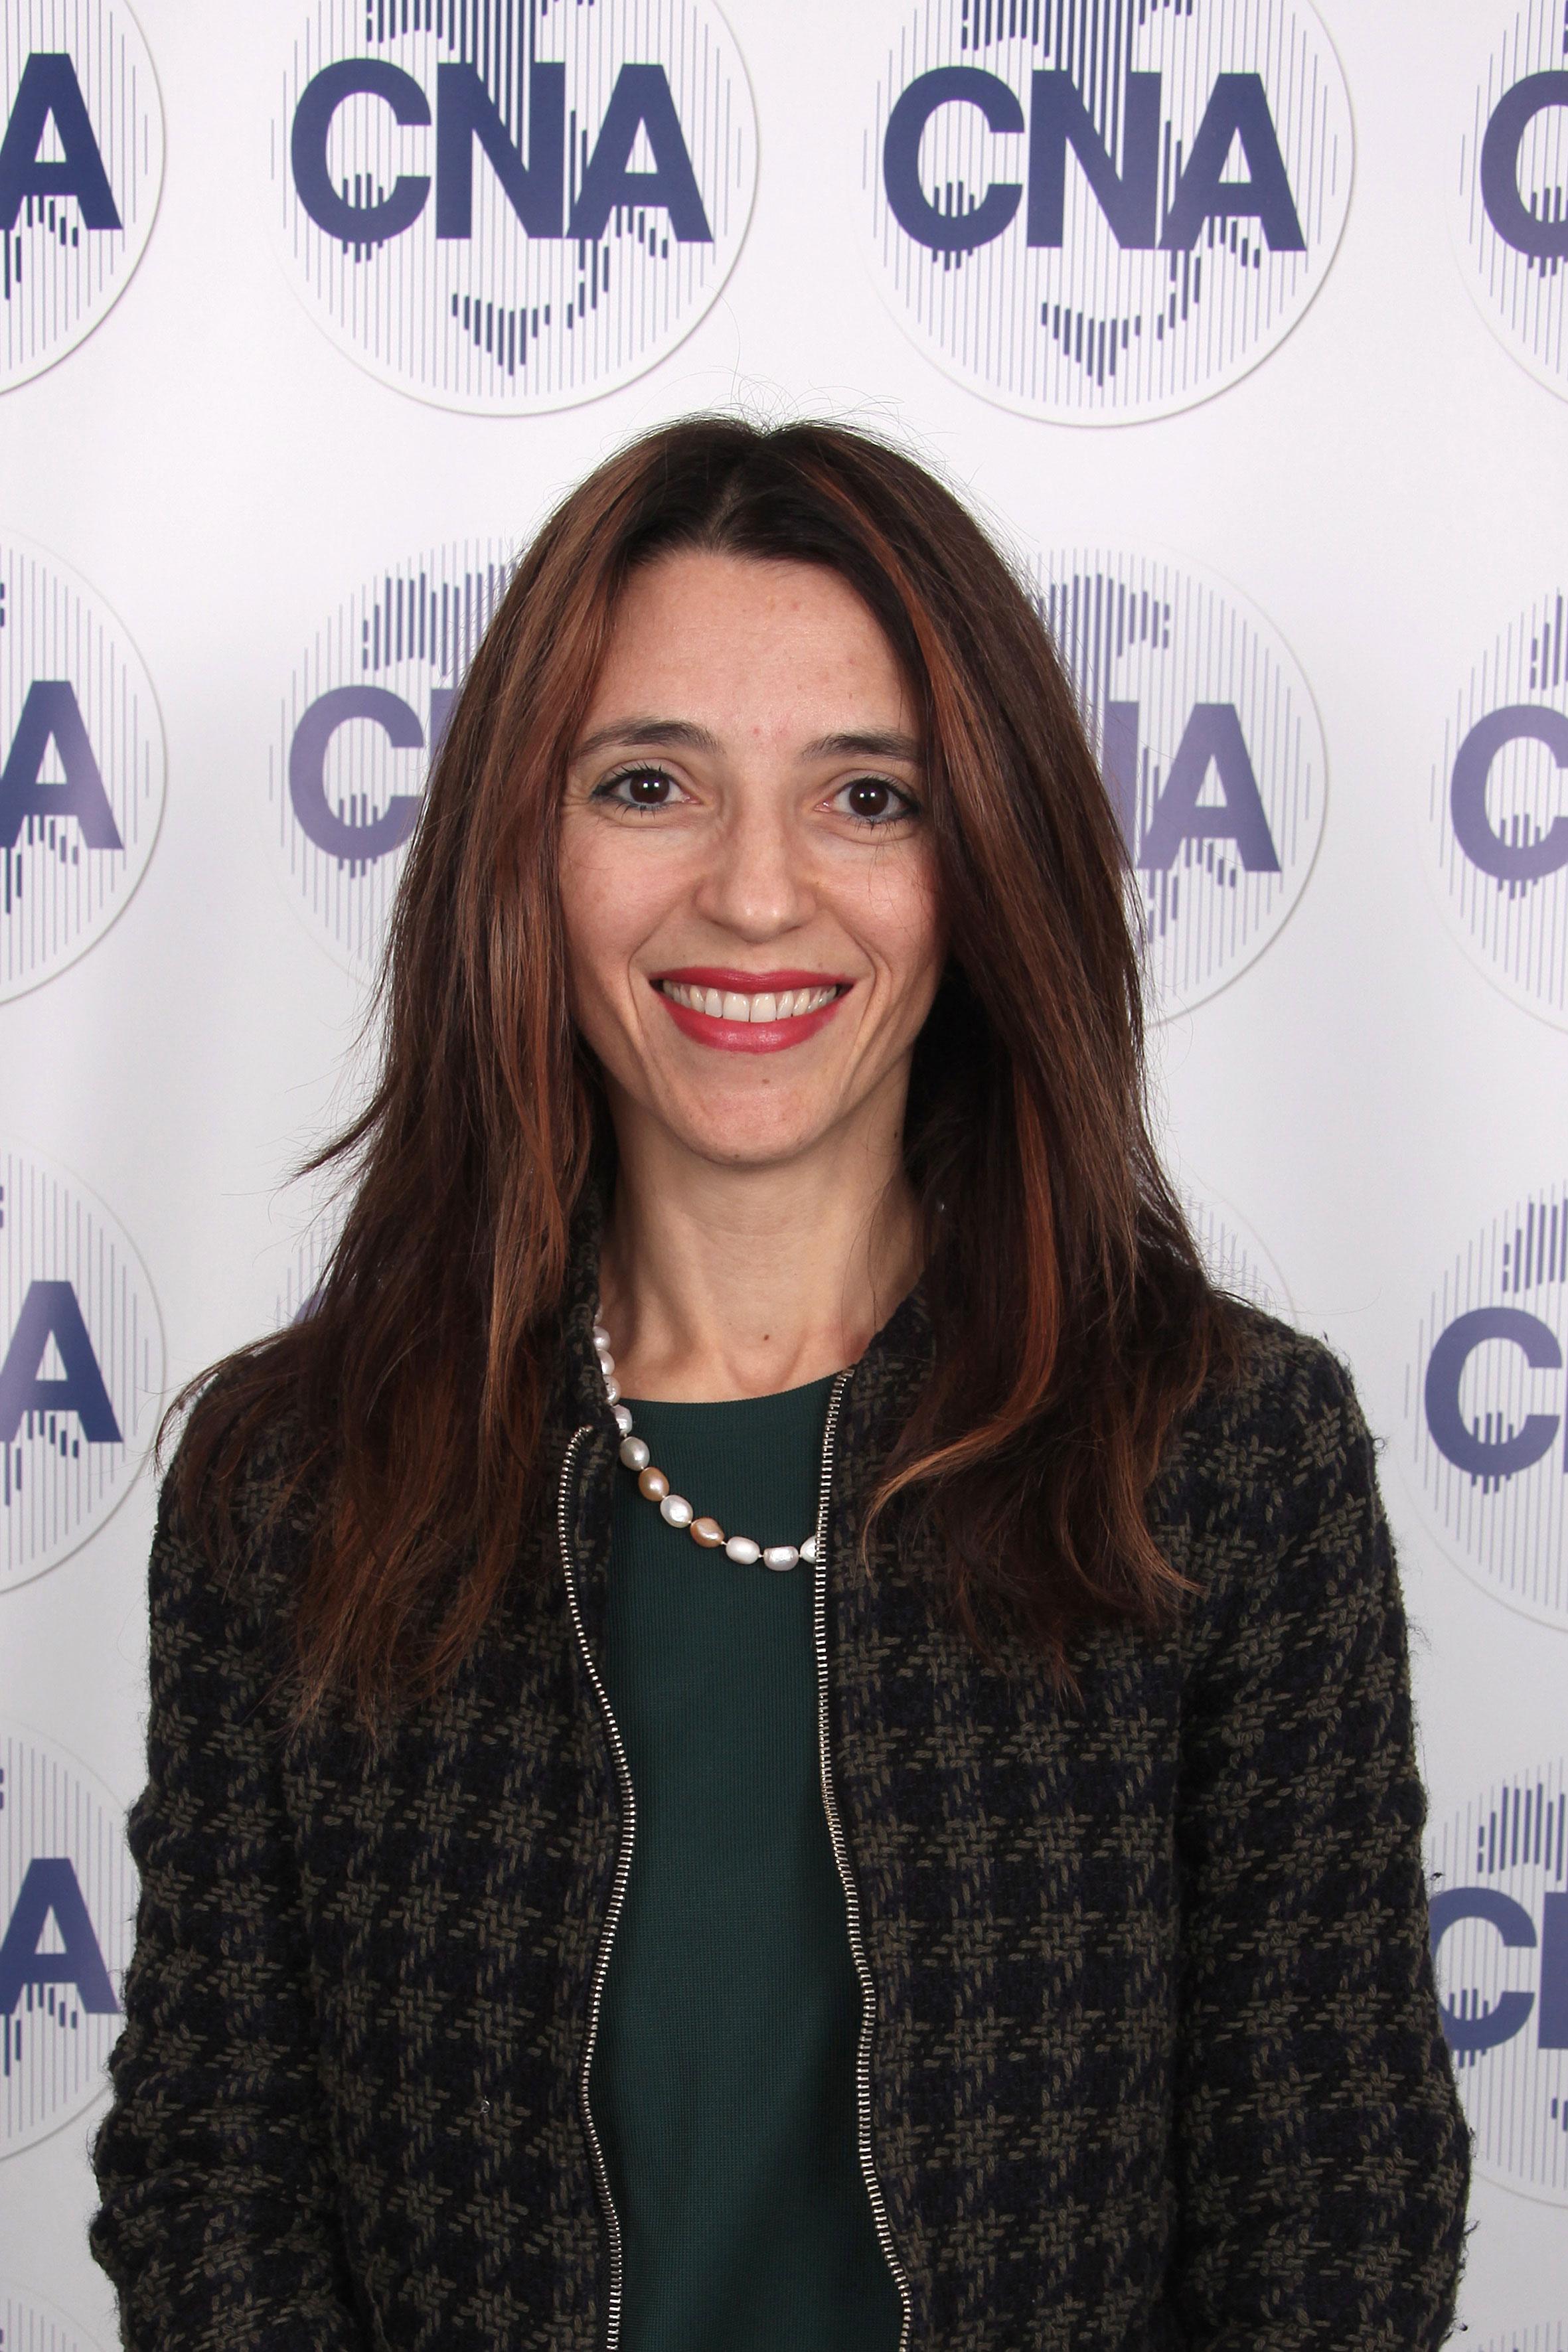 Panebarco Marianna - Vice Presidente